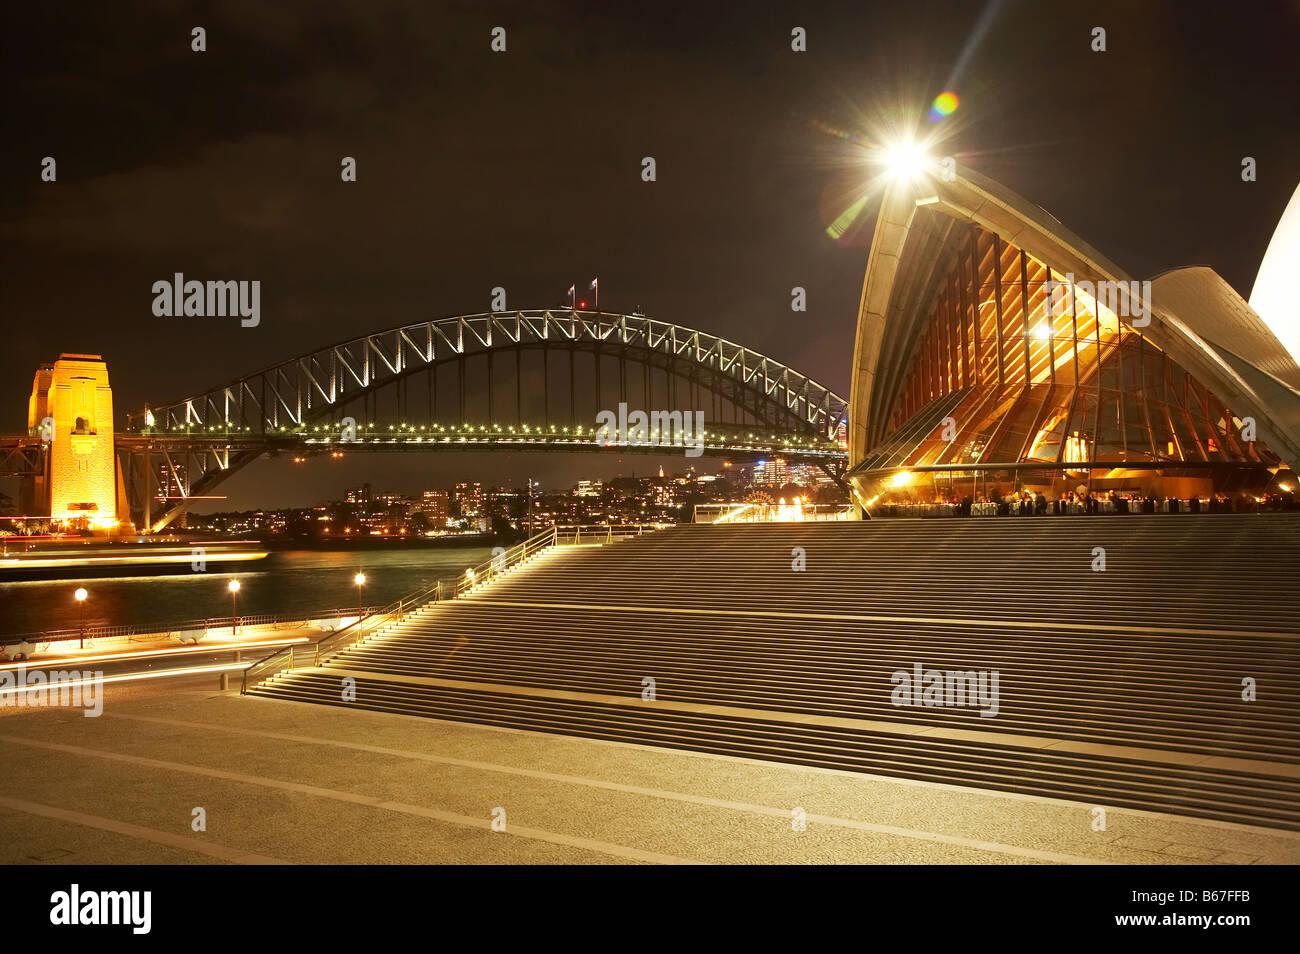 sydney harbour bridge and sydney opera house at night sydney new south B67FFB - 27+ Sydney Opera House Night Photos  Pics